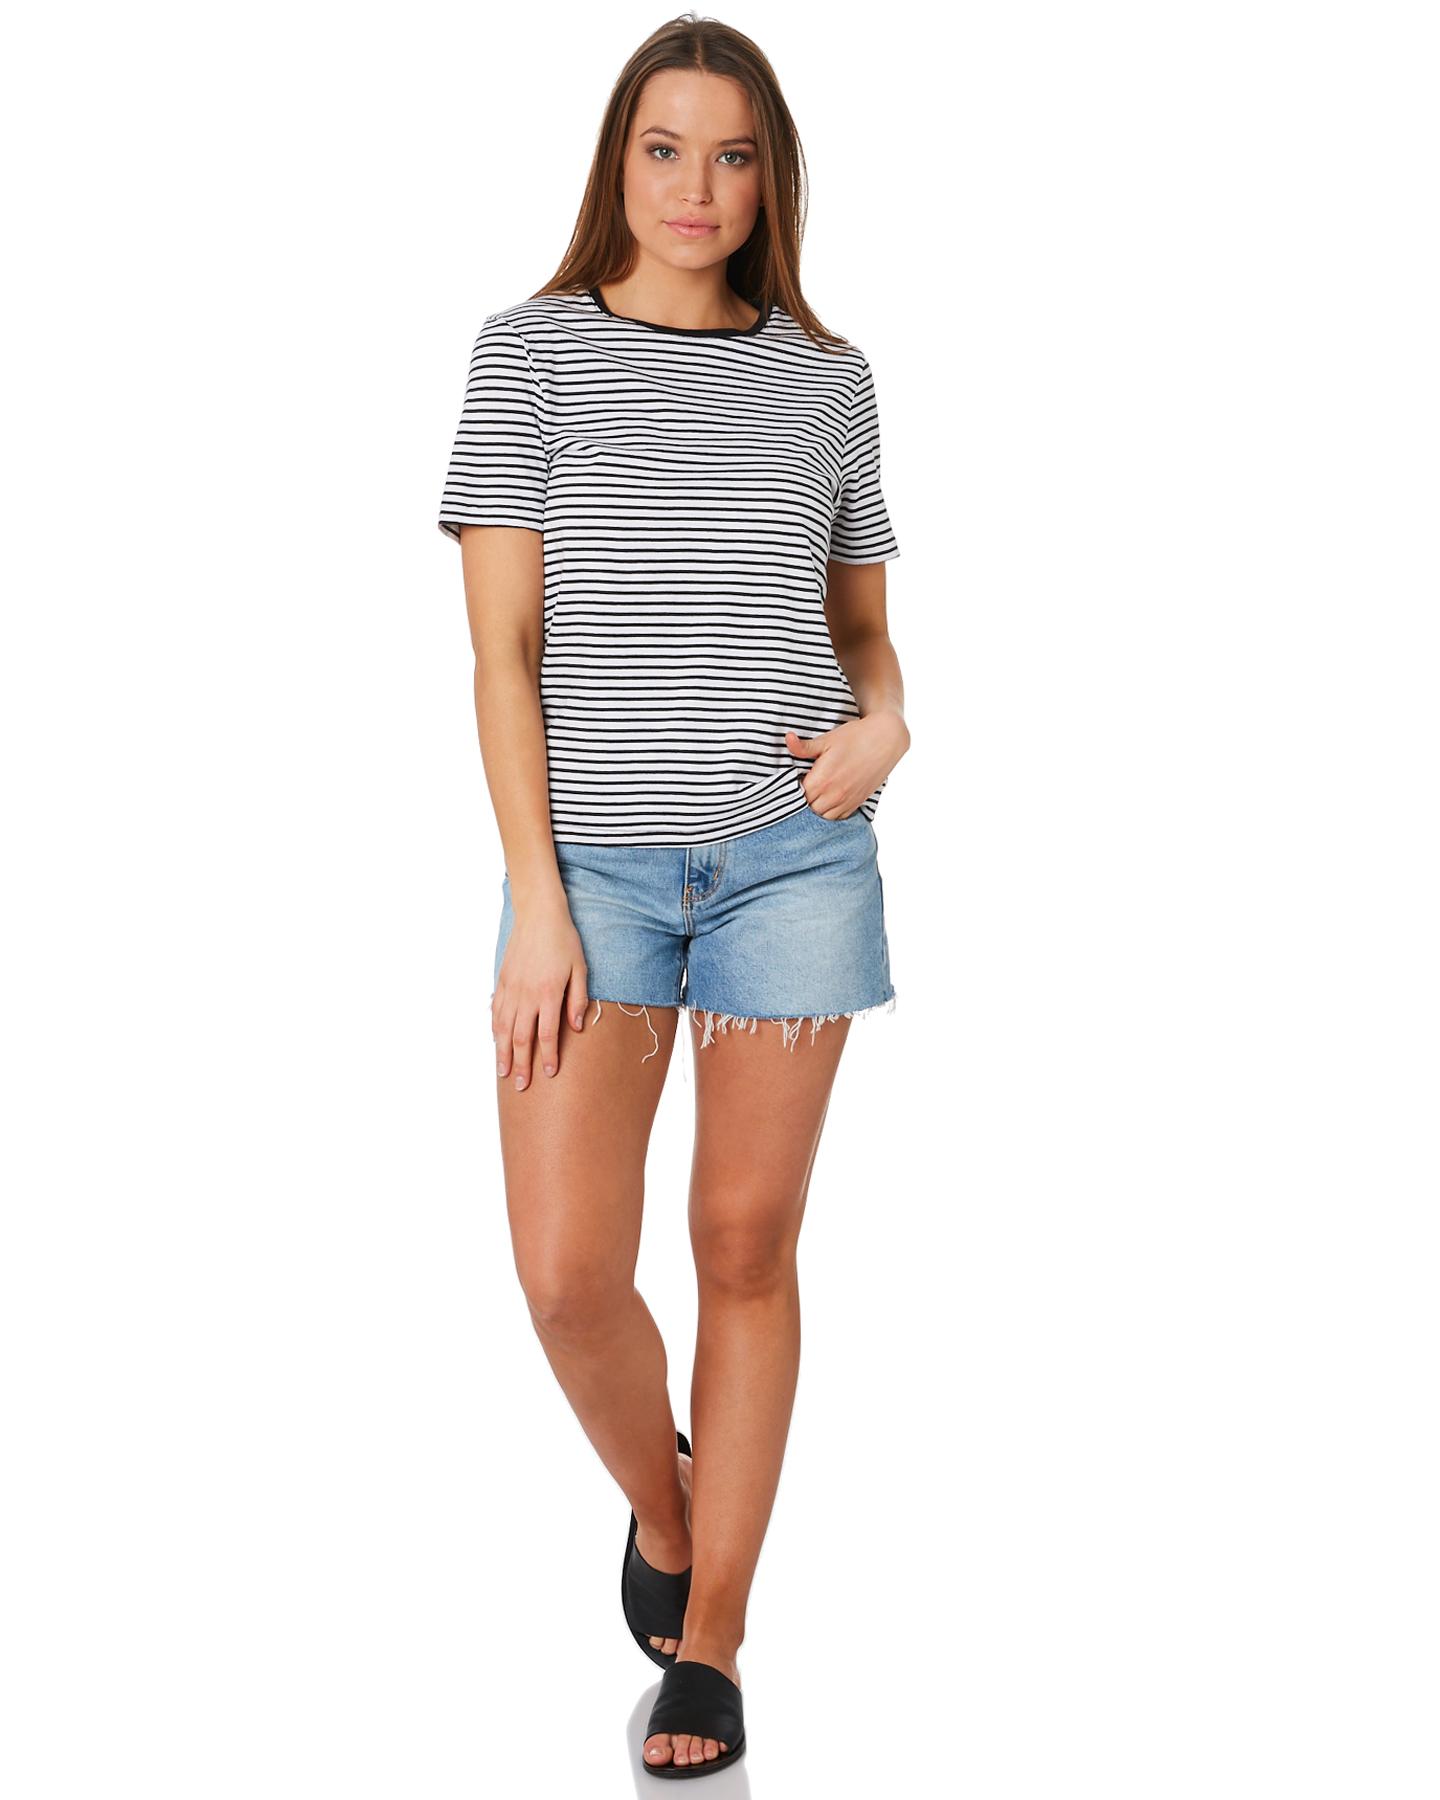 New-Swell-Women-039-s-Jesse-Stripe-Tee-Crew-Neck-Short-Sleeve-Cotton thumbnail 10